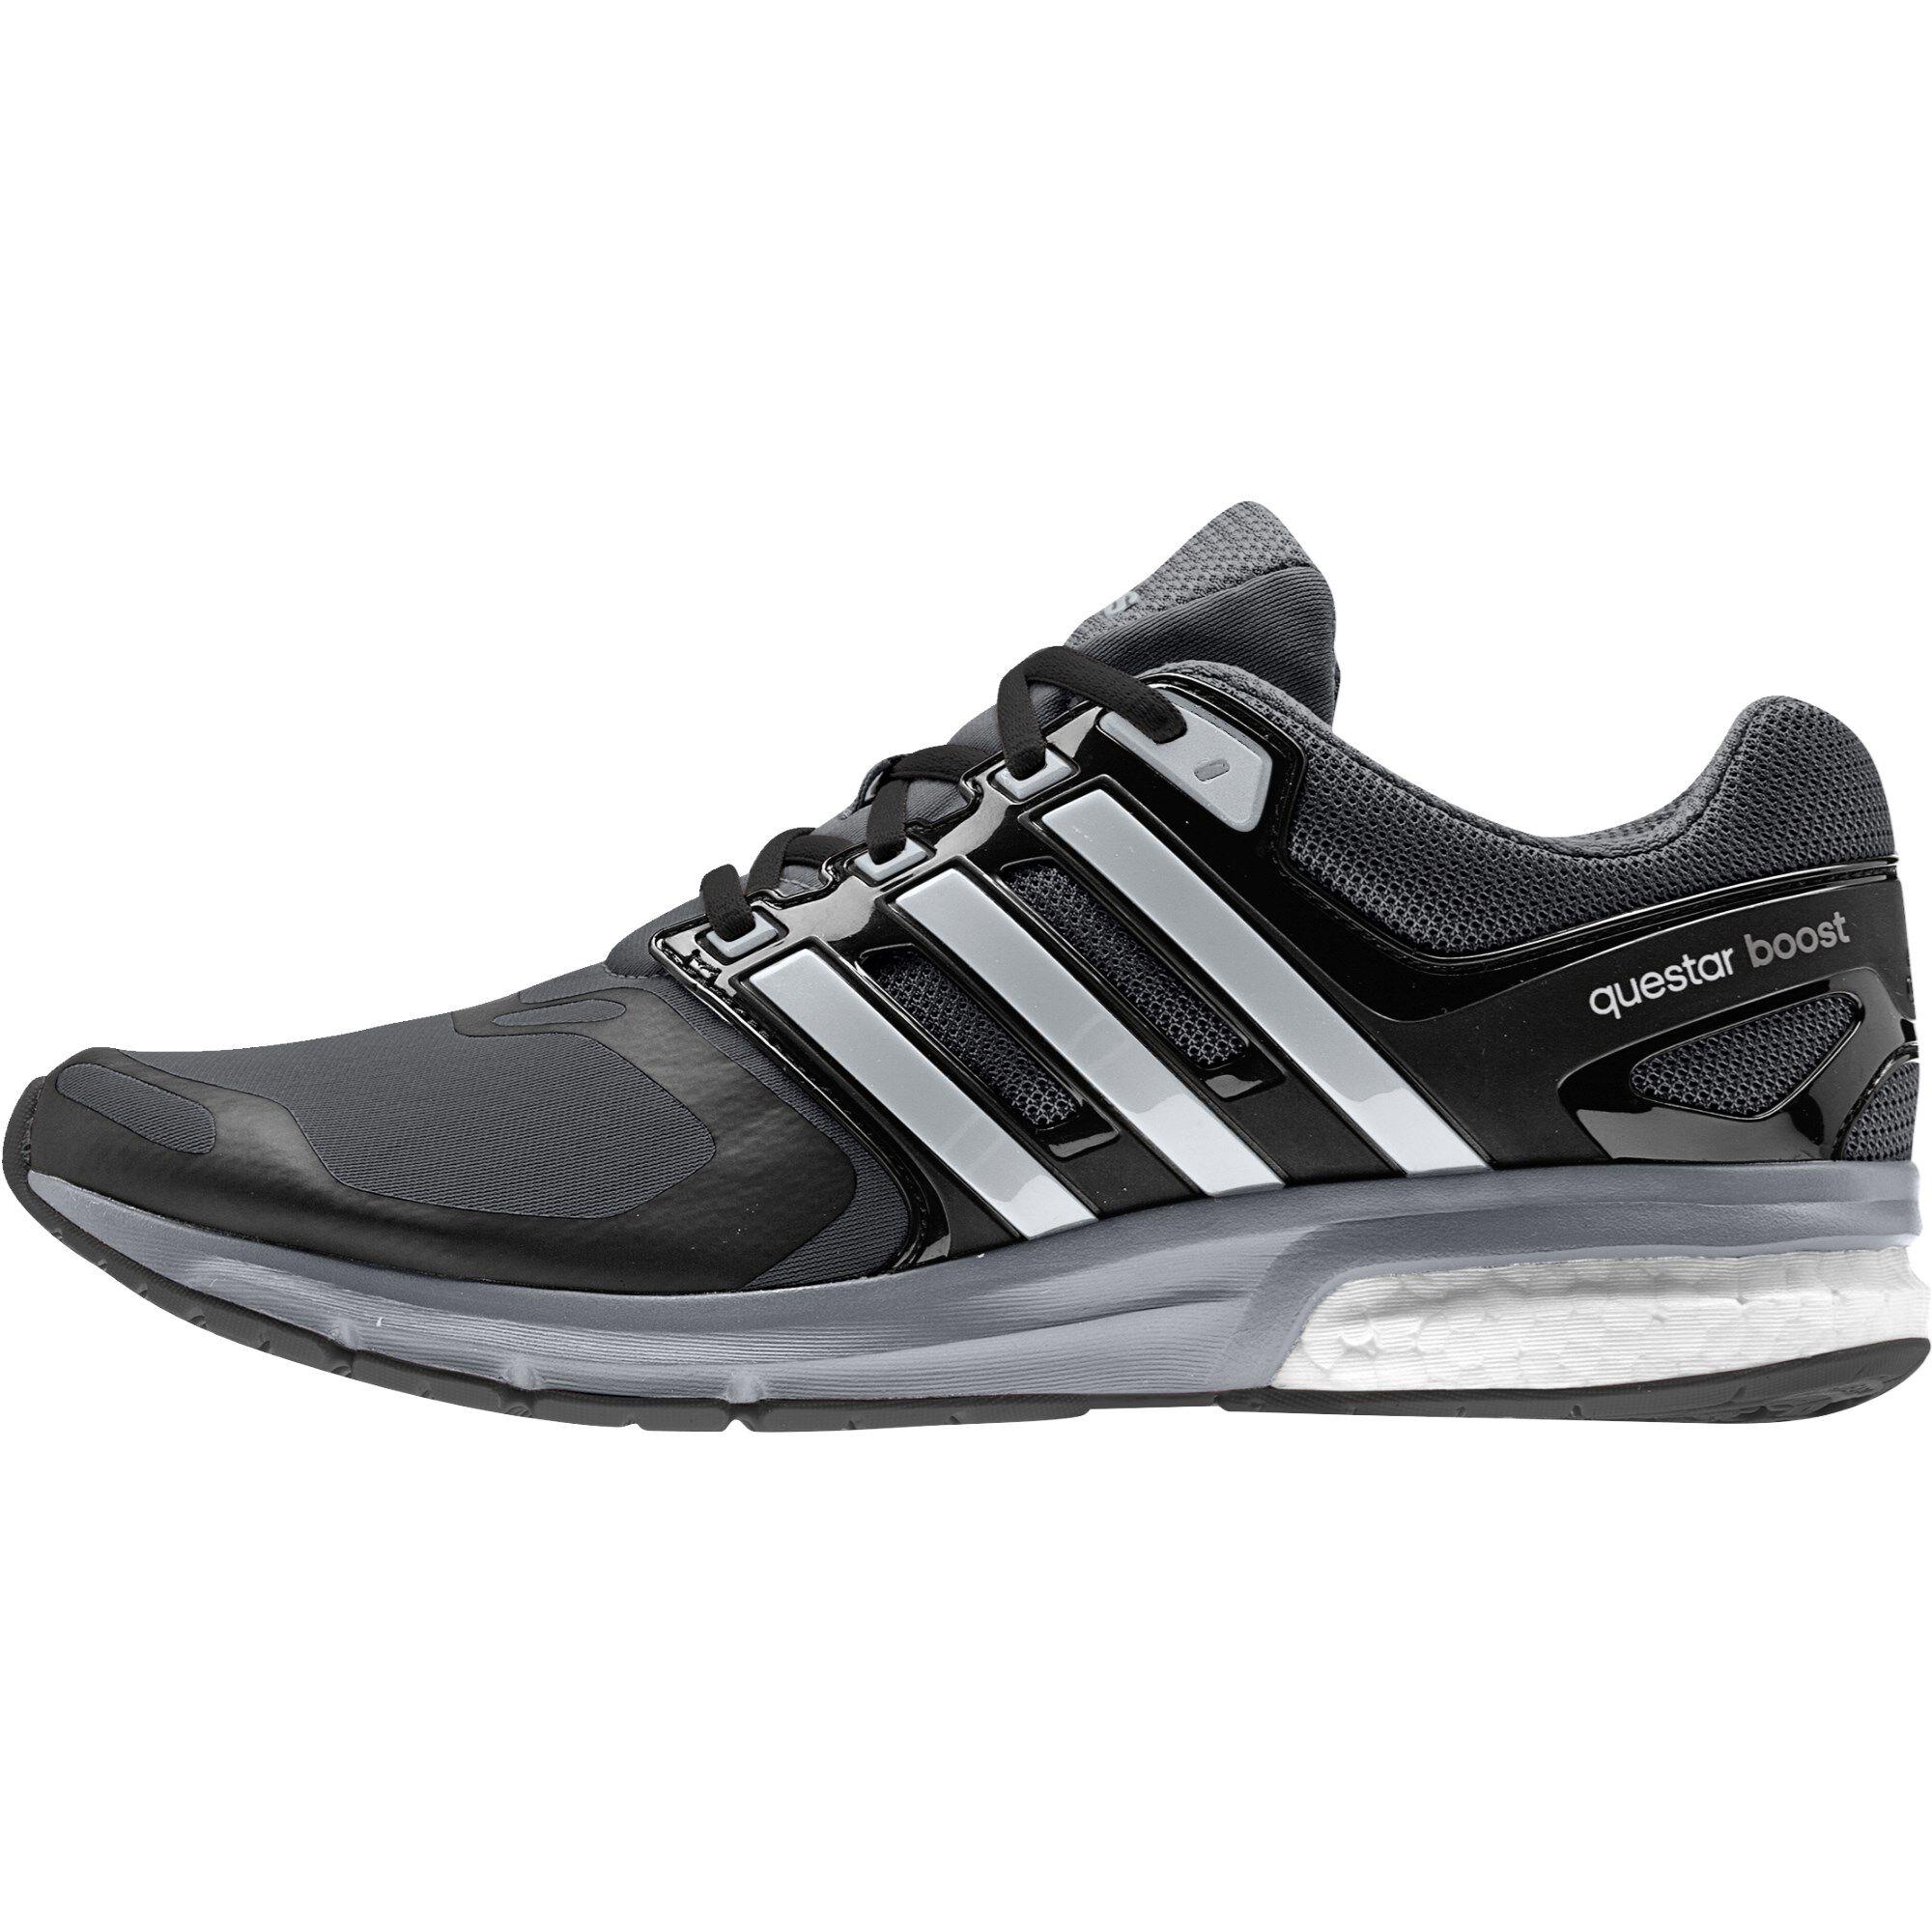 wiggle.dk | adidas Questar Boost TF Shoes | Løbesko